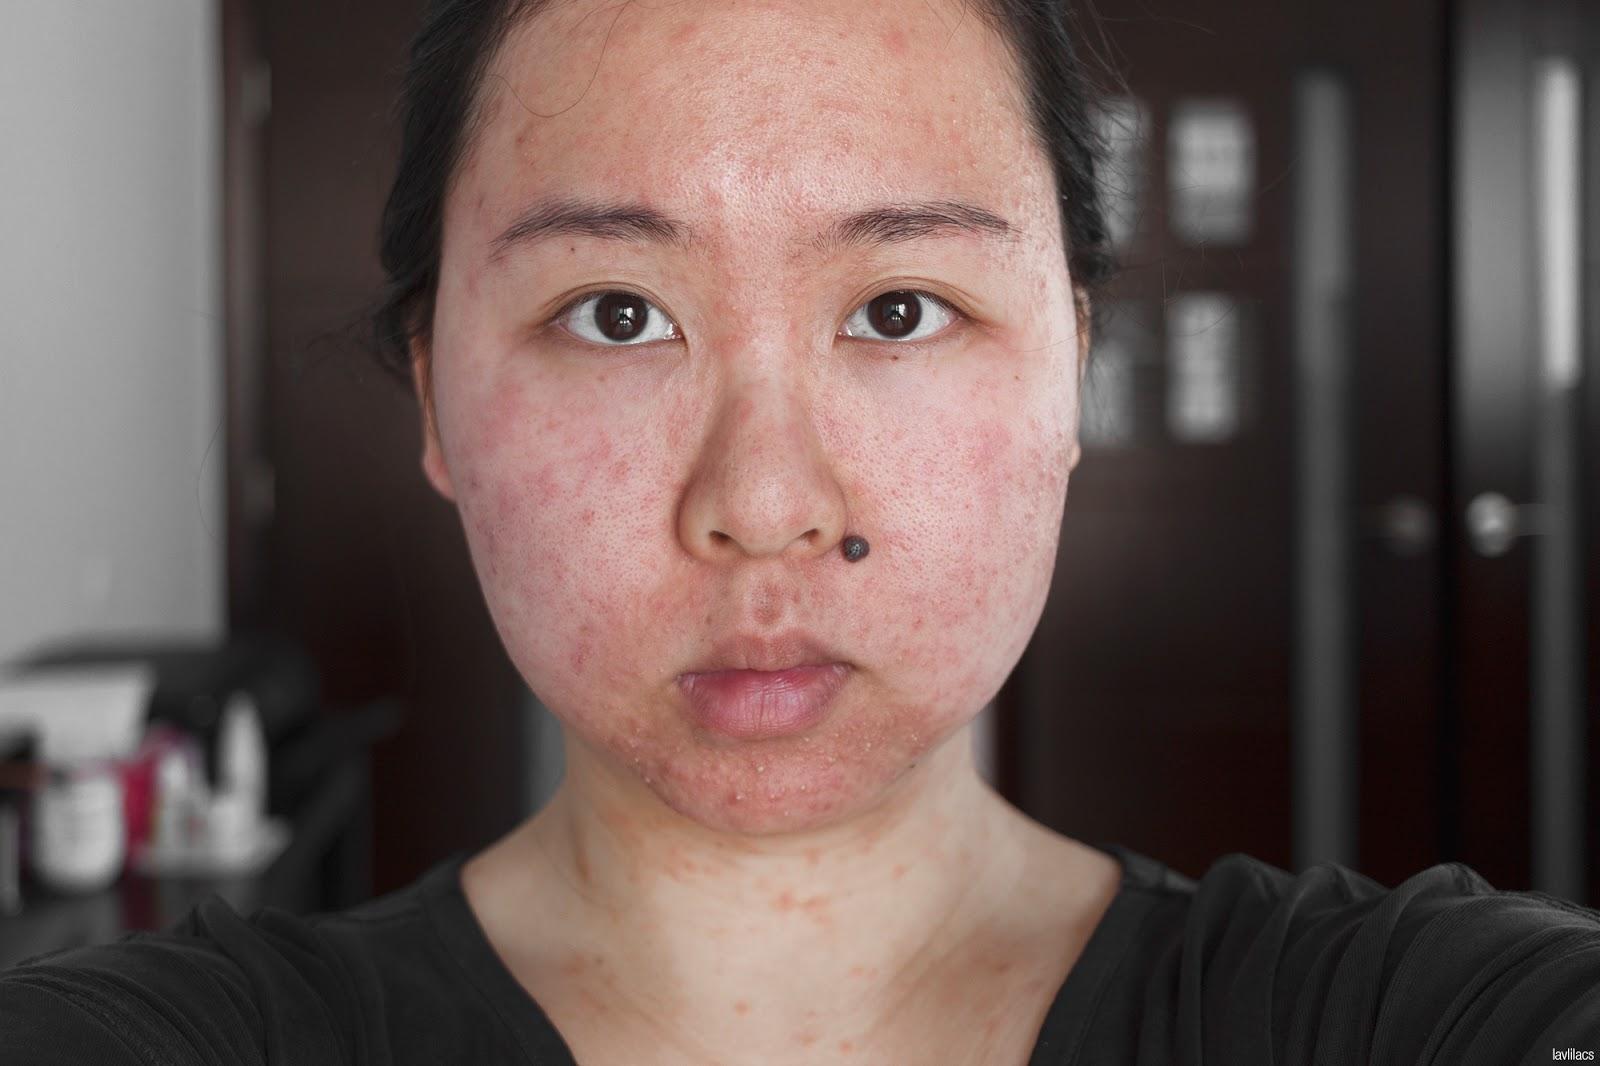 skin allergy - 2 days after reaction